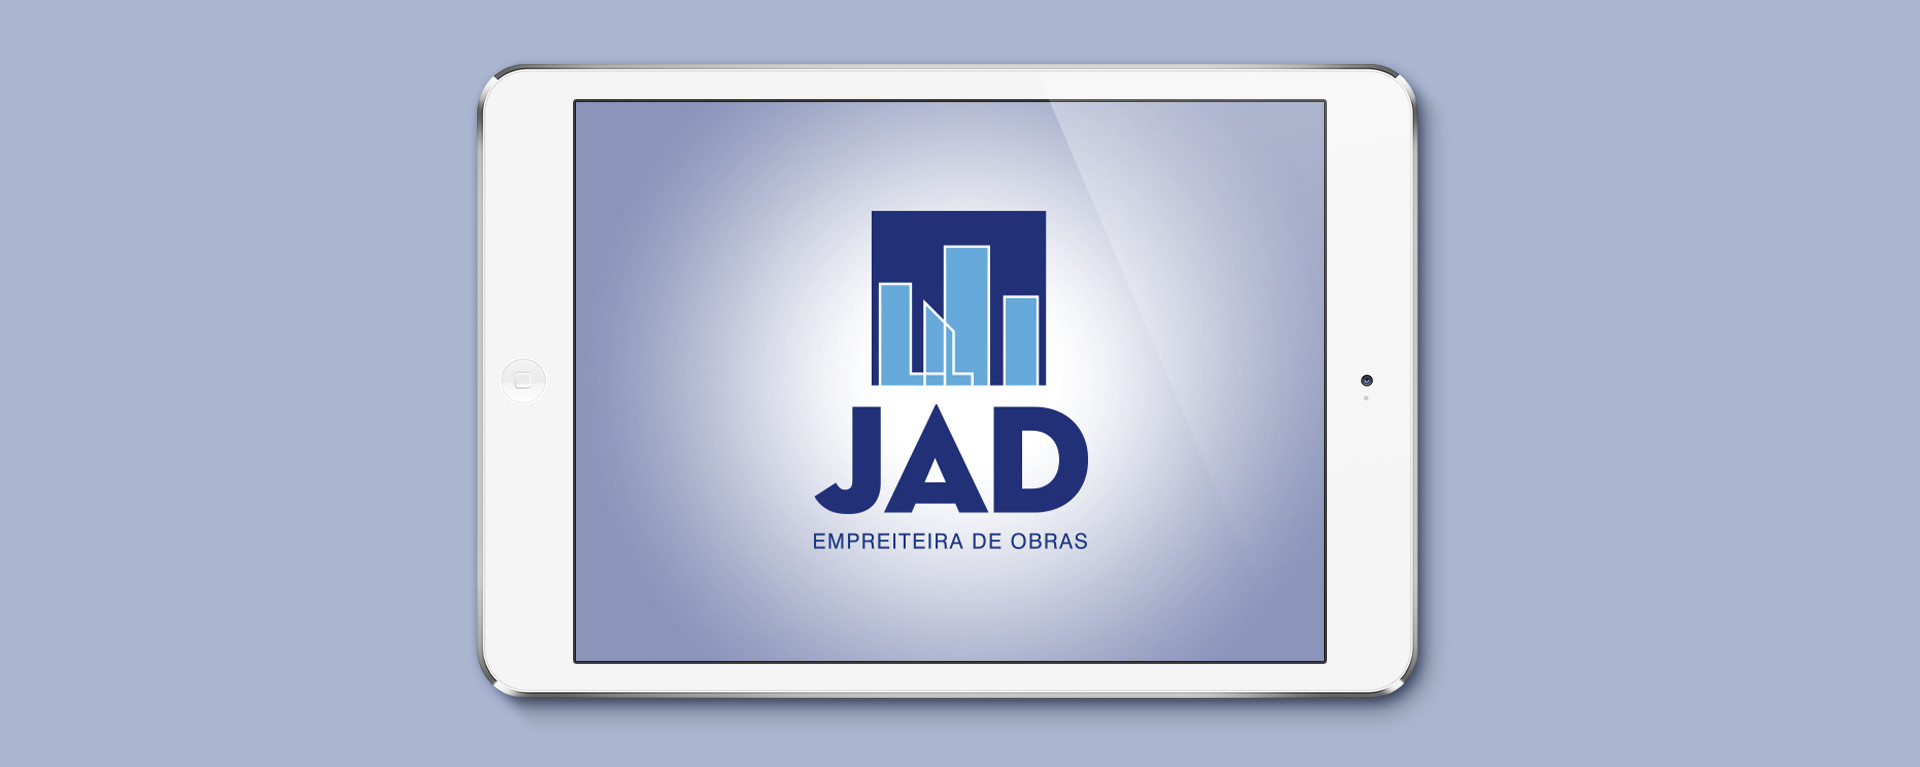 Logotipo JAD Empreiteira